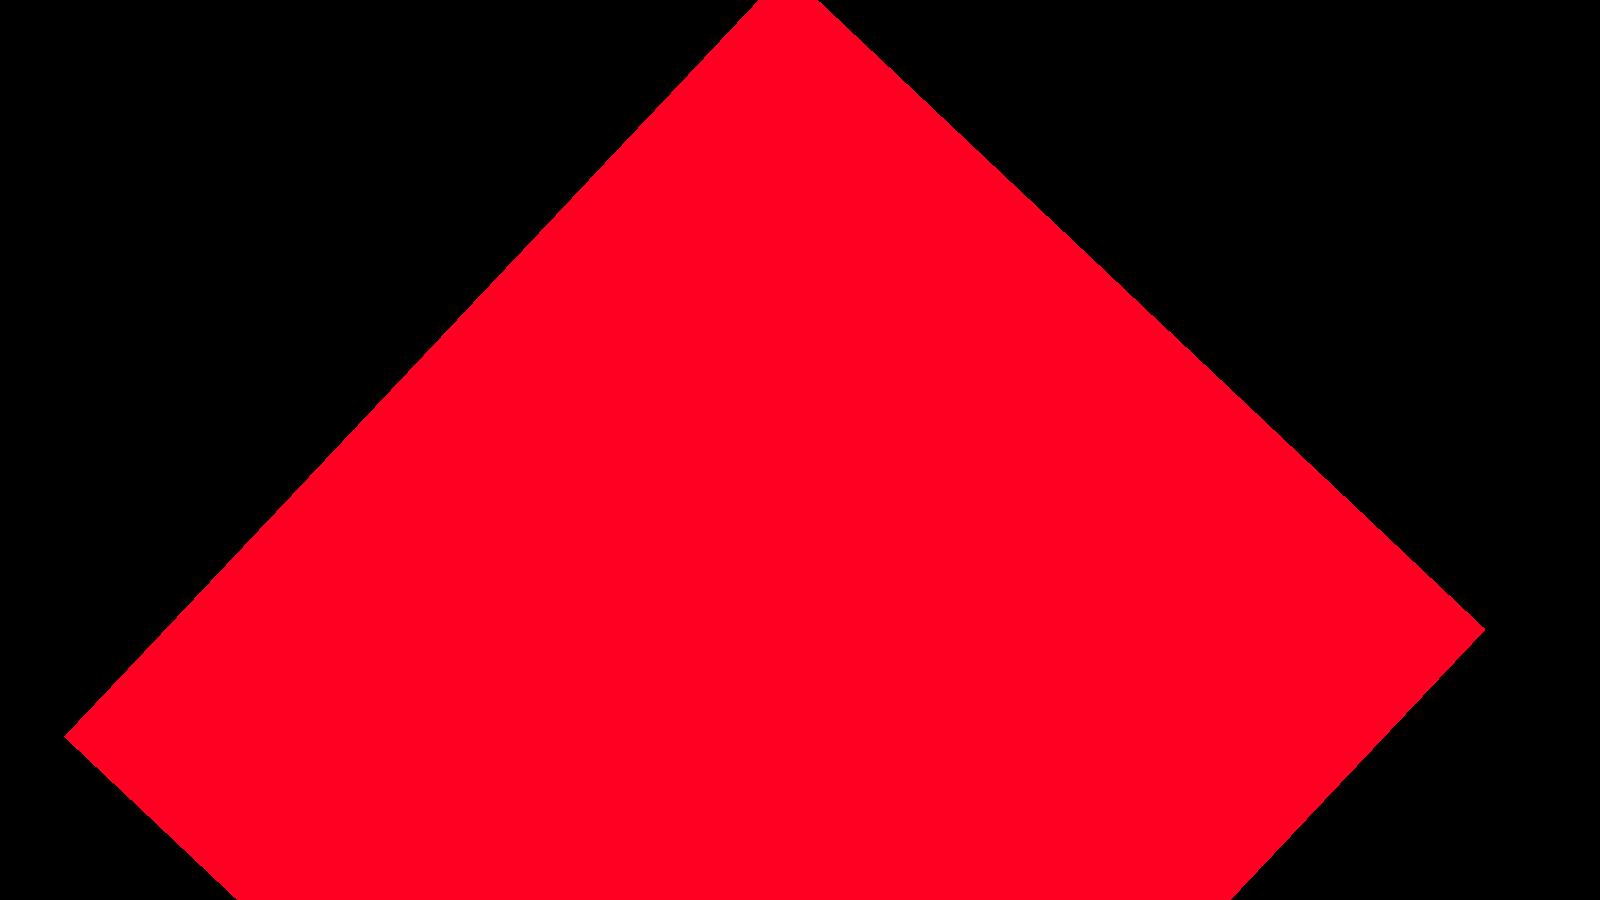 Shapes PNG HD